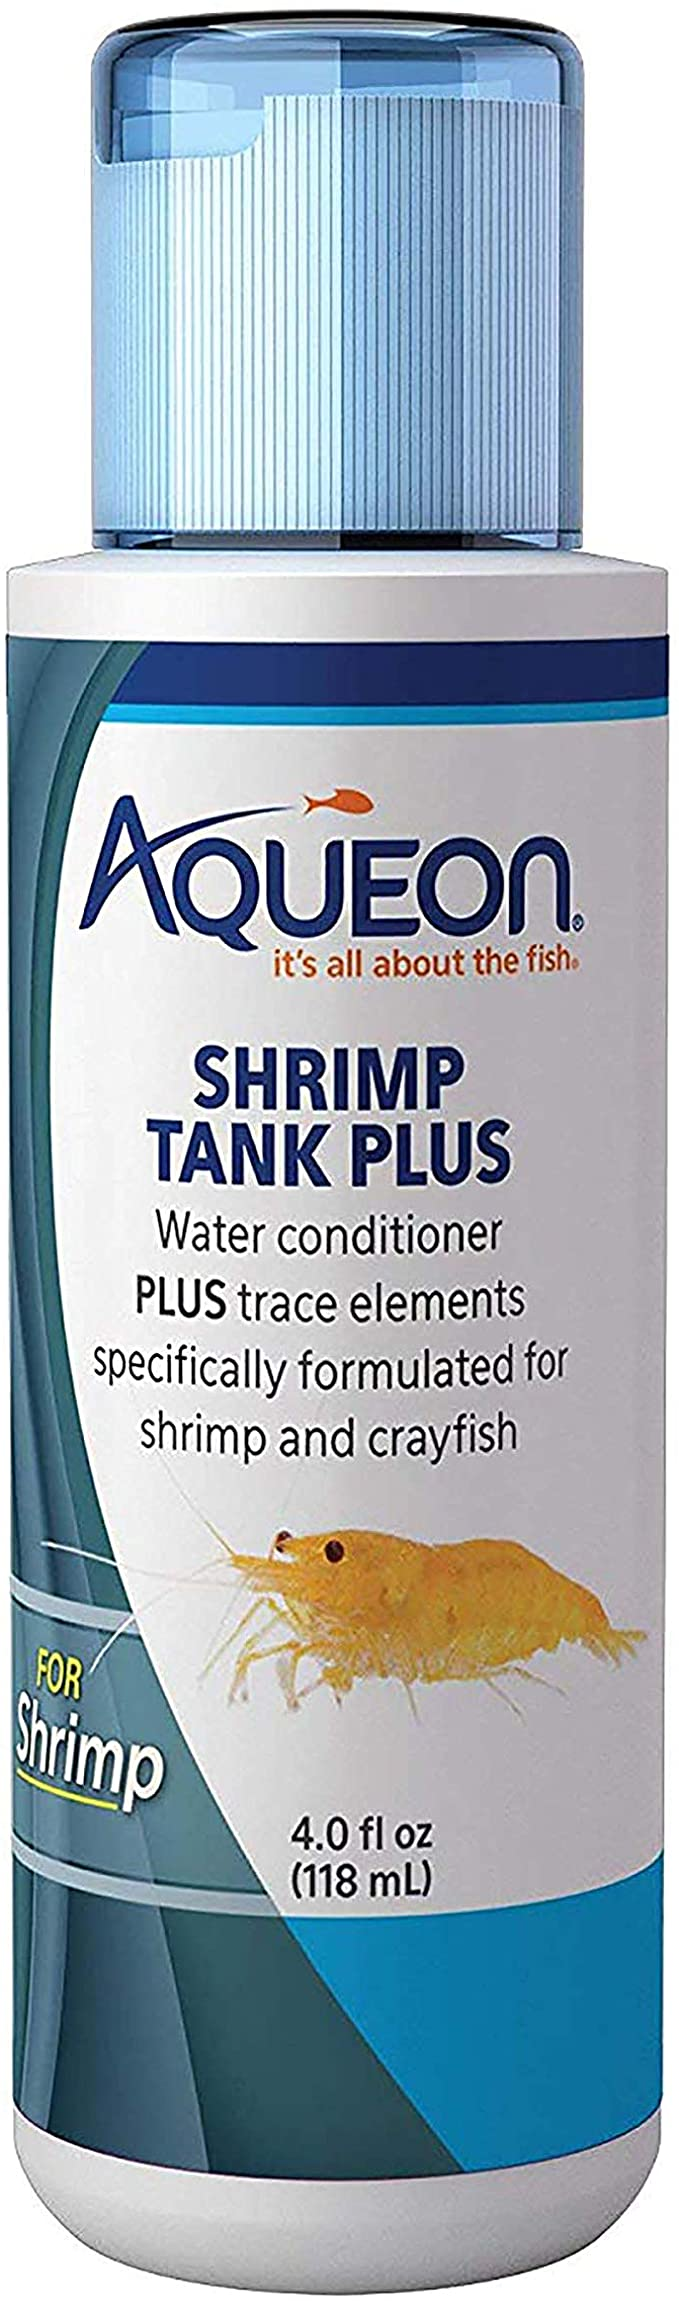 Aqueon 100536241 product image 1